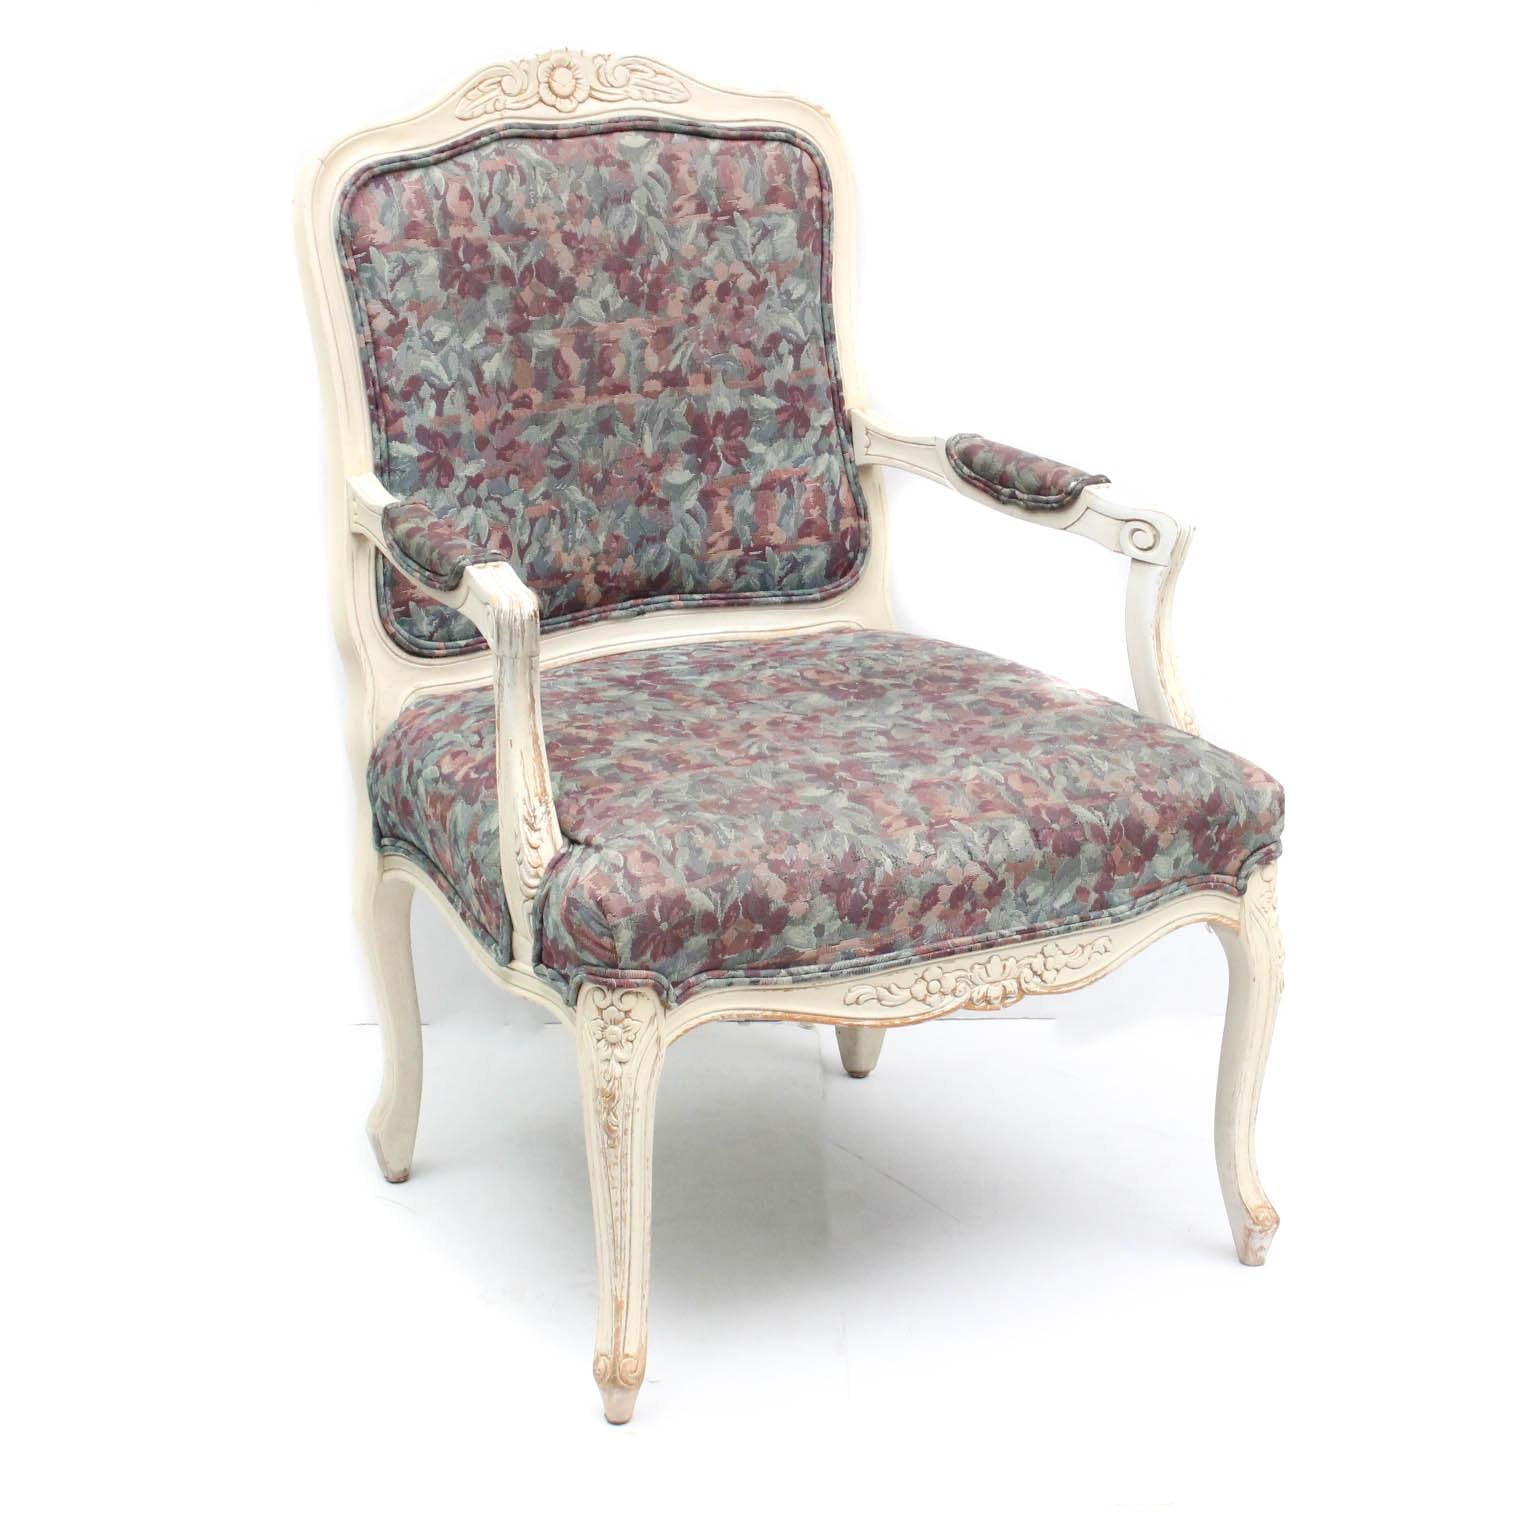 Louis IV Style Arm Chair